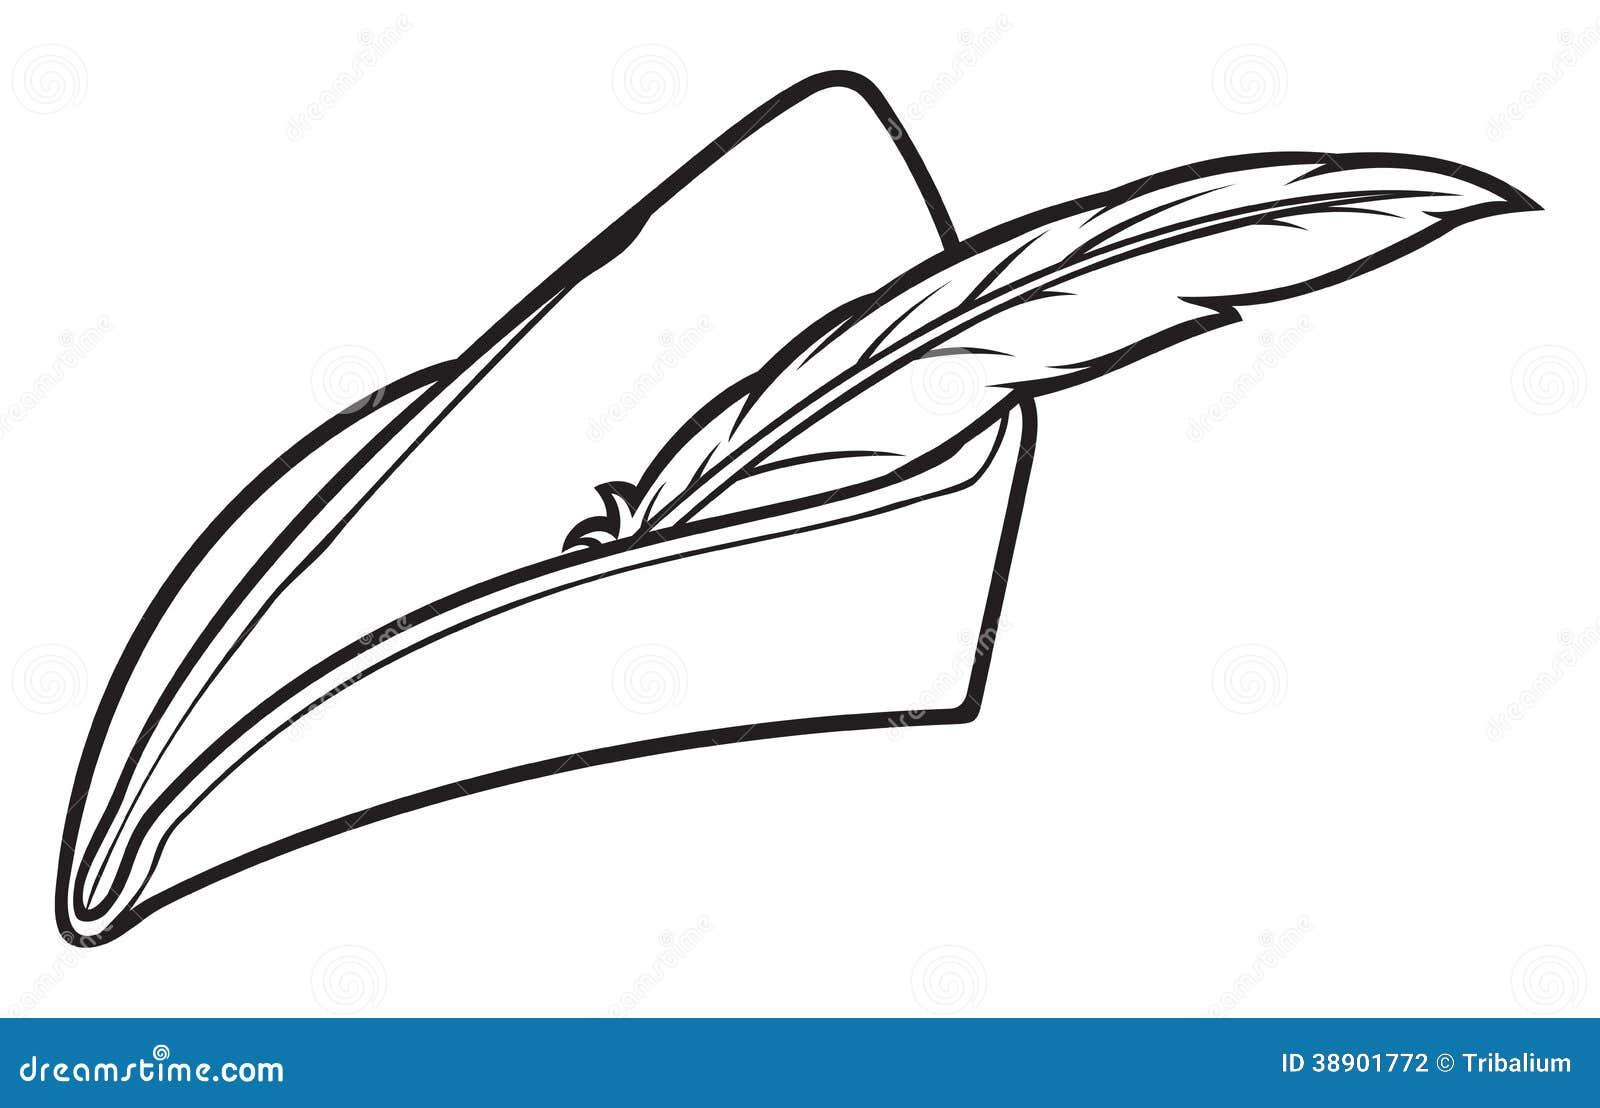 Robin Hood Hut Vektor Abbildung Illustration Von Pfeil 38901772